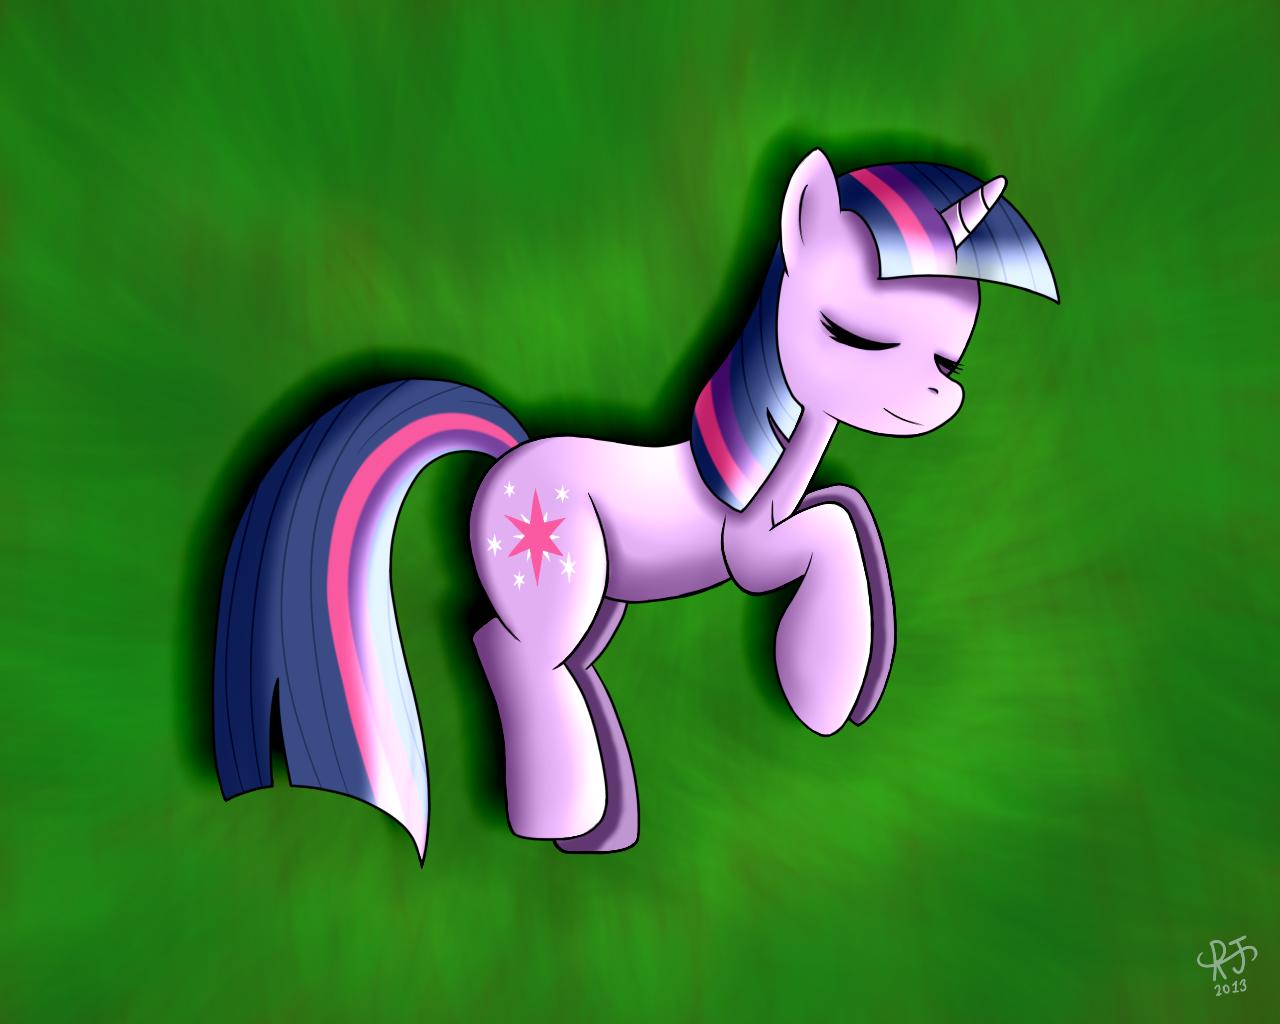 Twilight Sparkle by RainbowJET